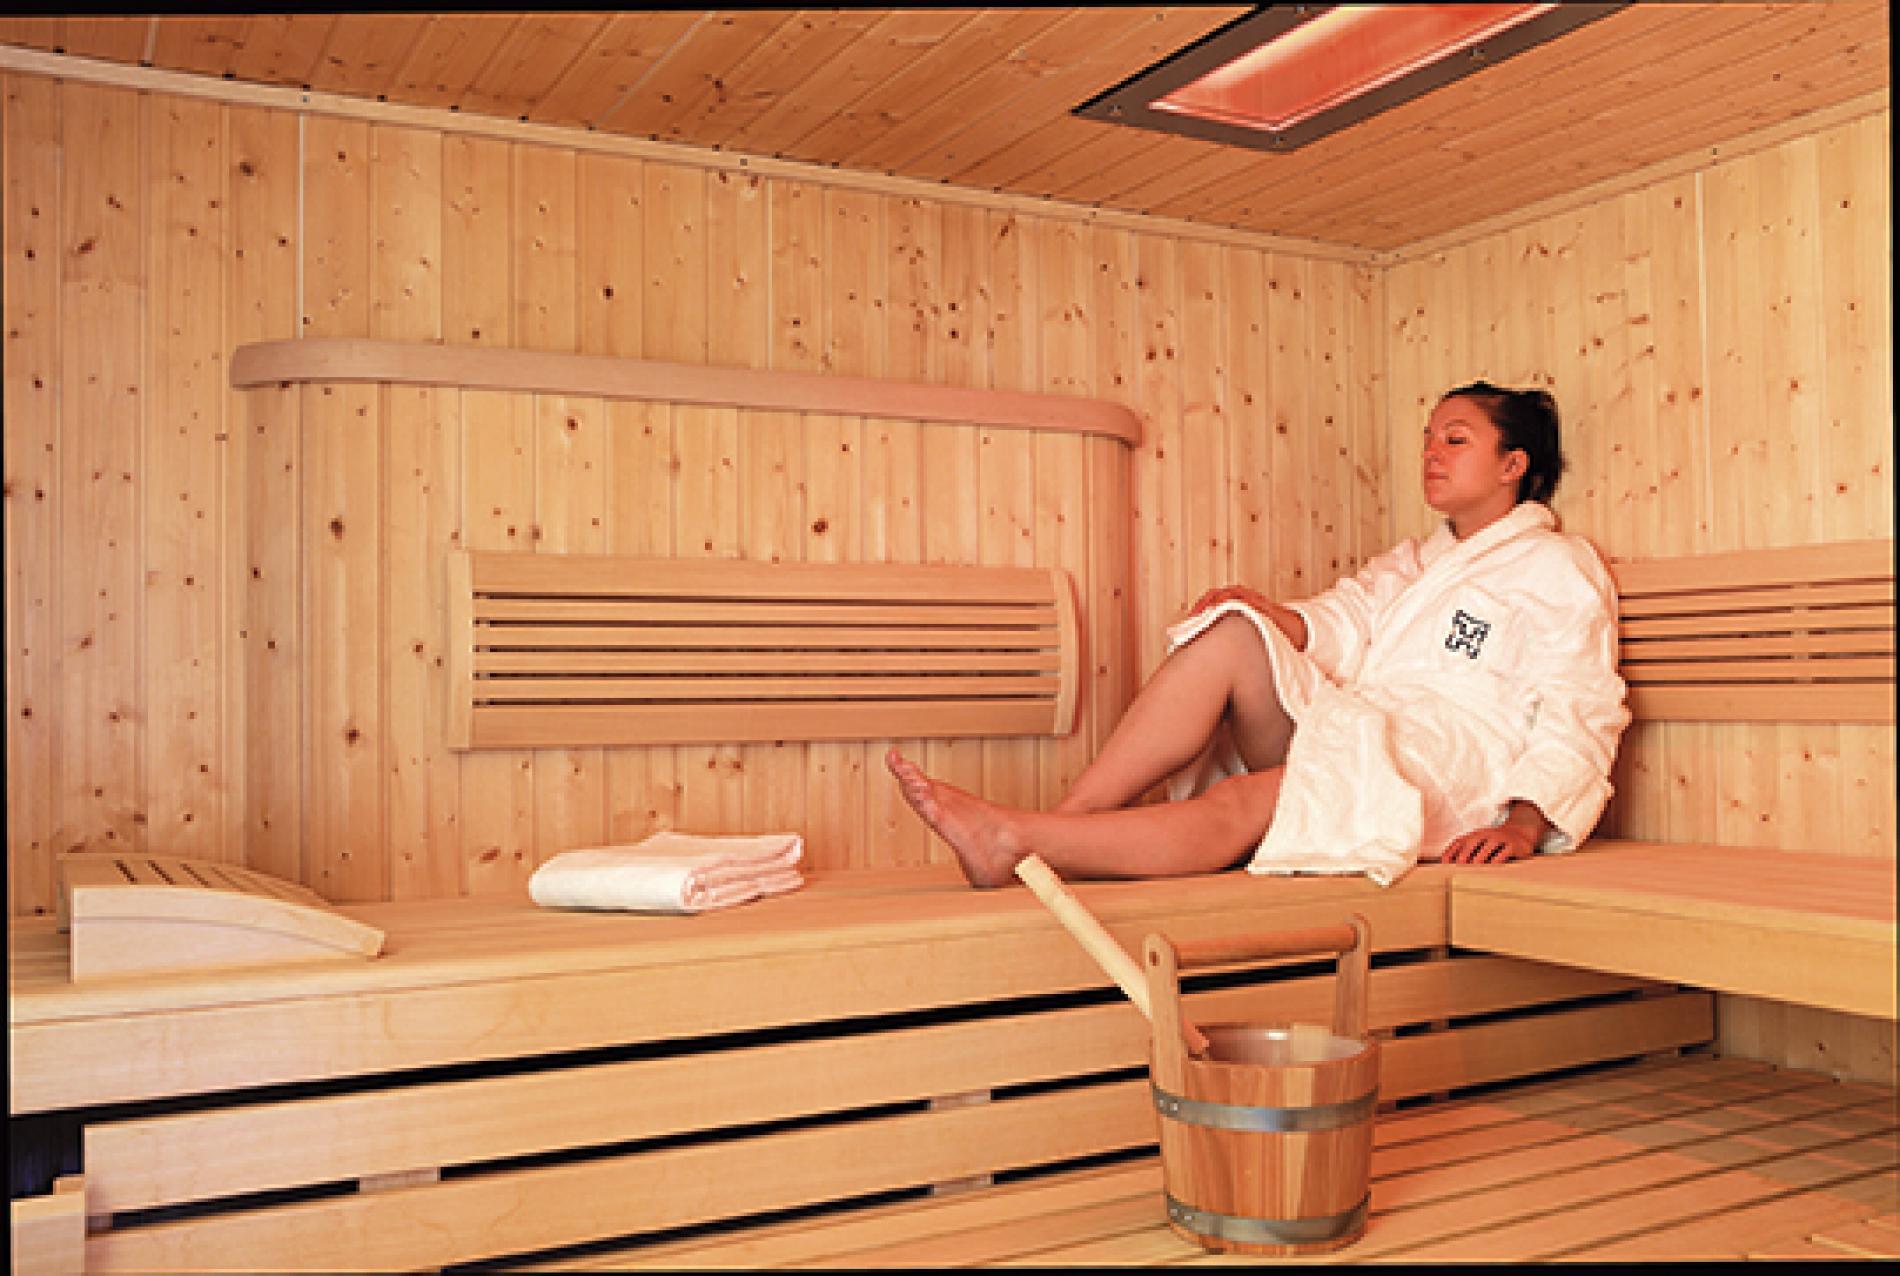 Sauna finlandais